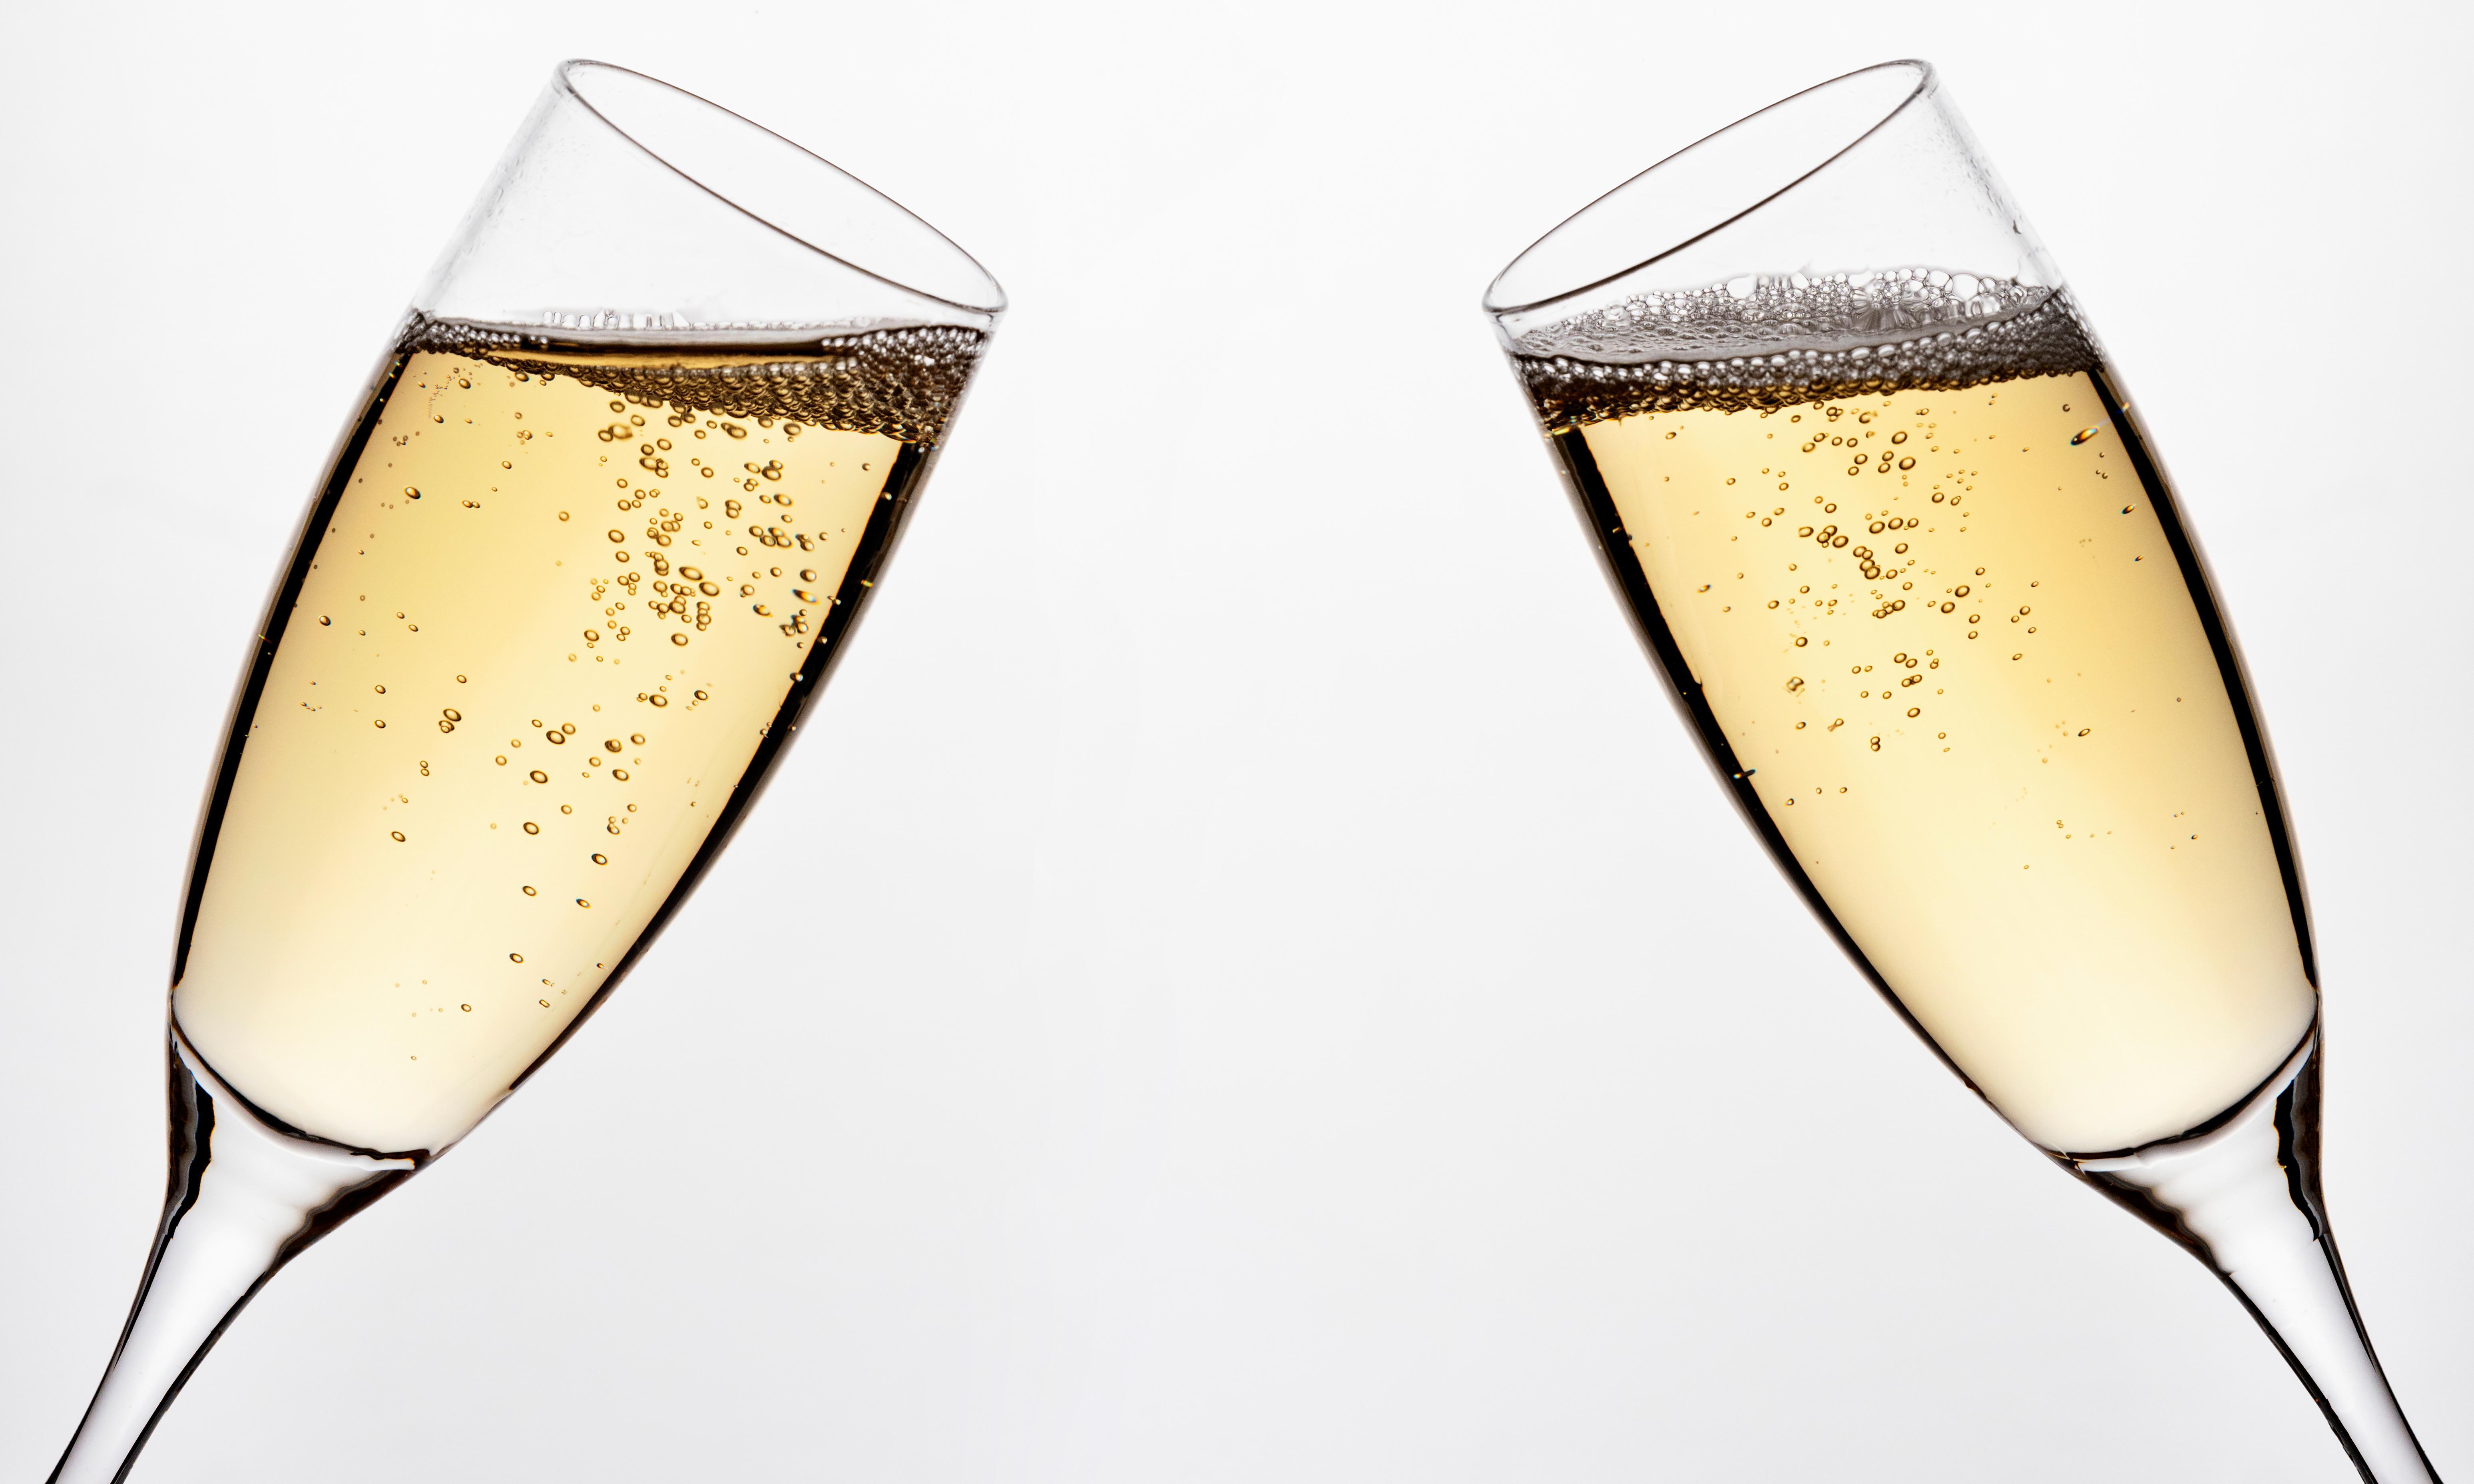 Waitrose champagne named best-value bubbly for Christmas